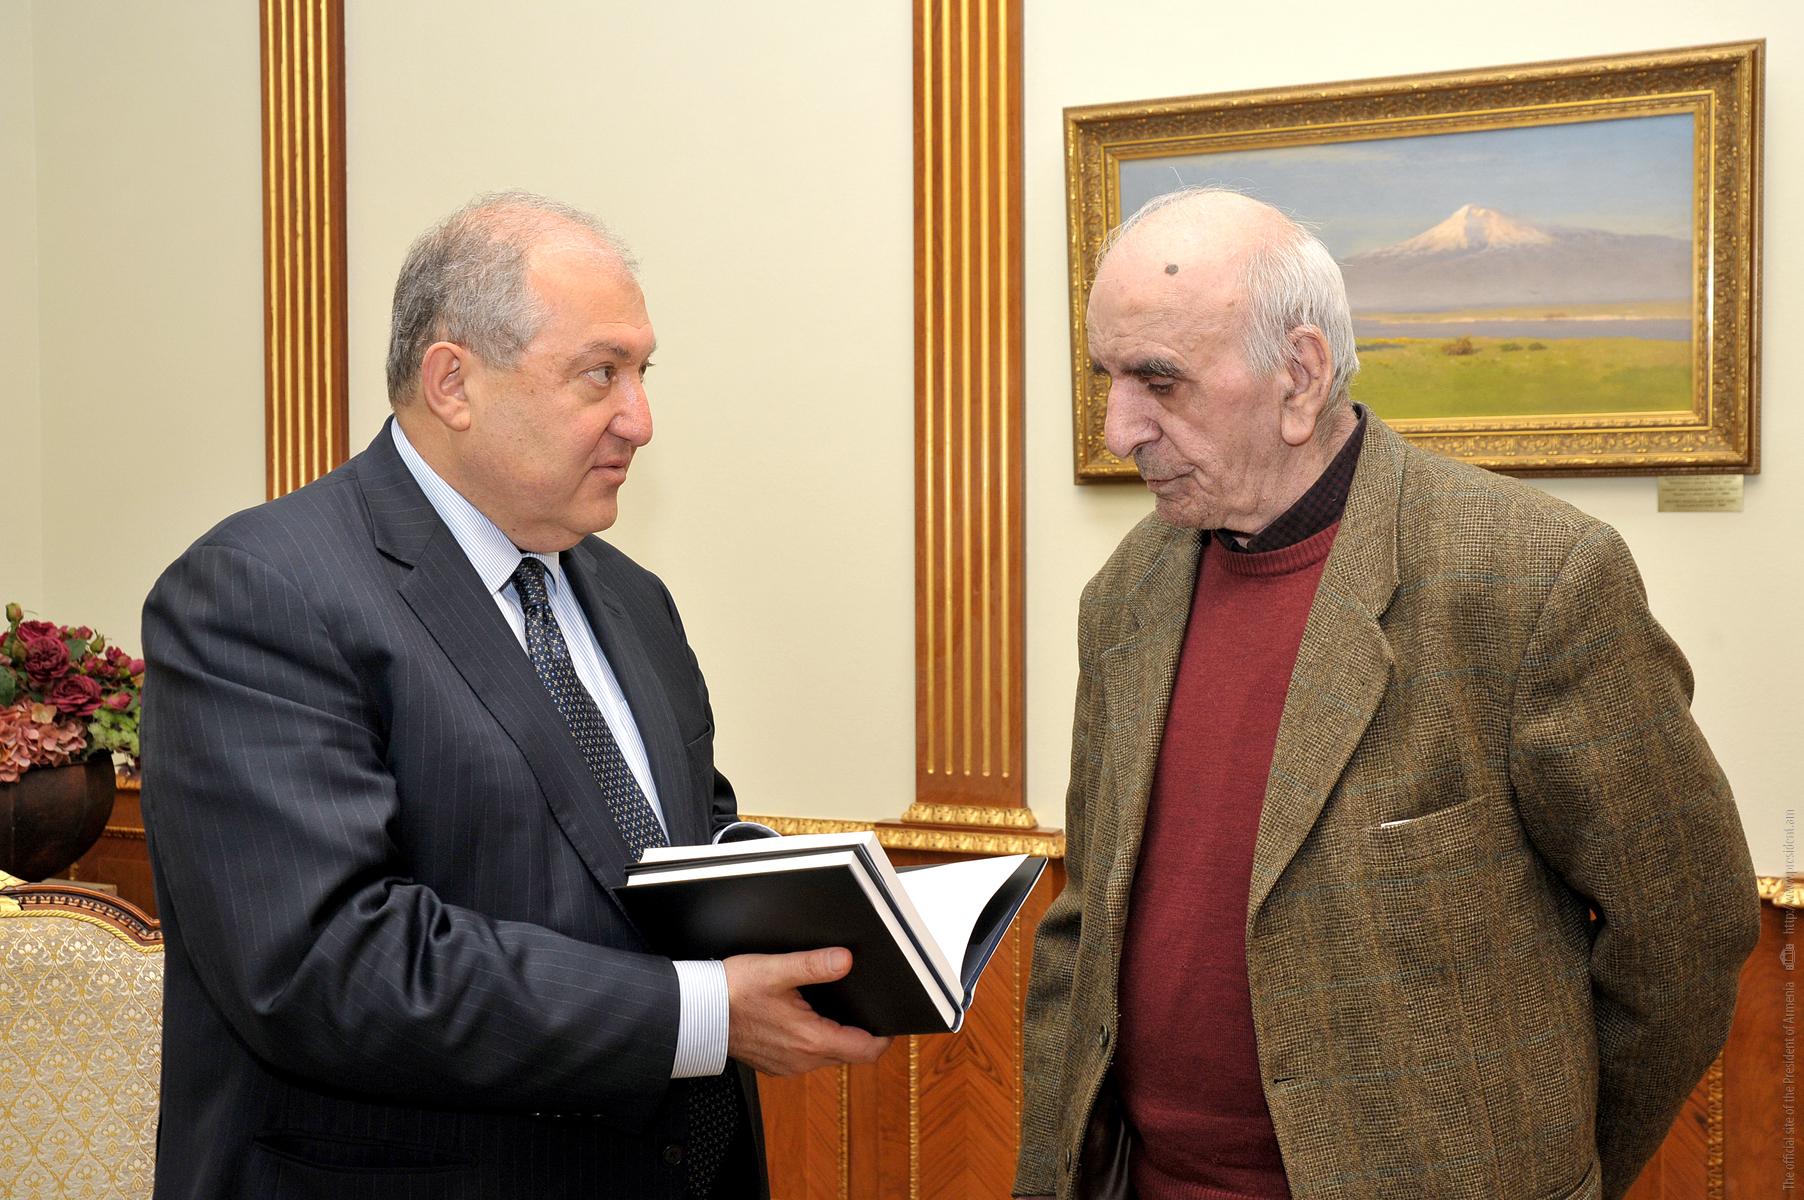 Артавазд Пелешян подарил свою книгу президенту Армену Саркисяну